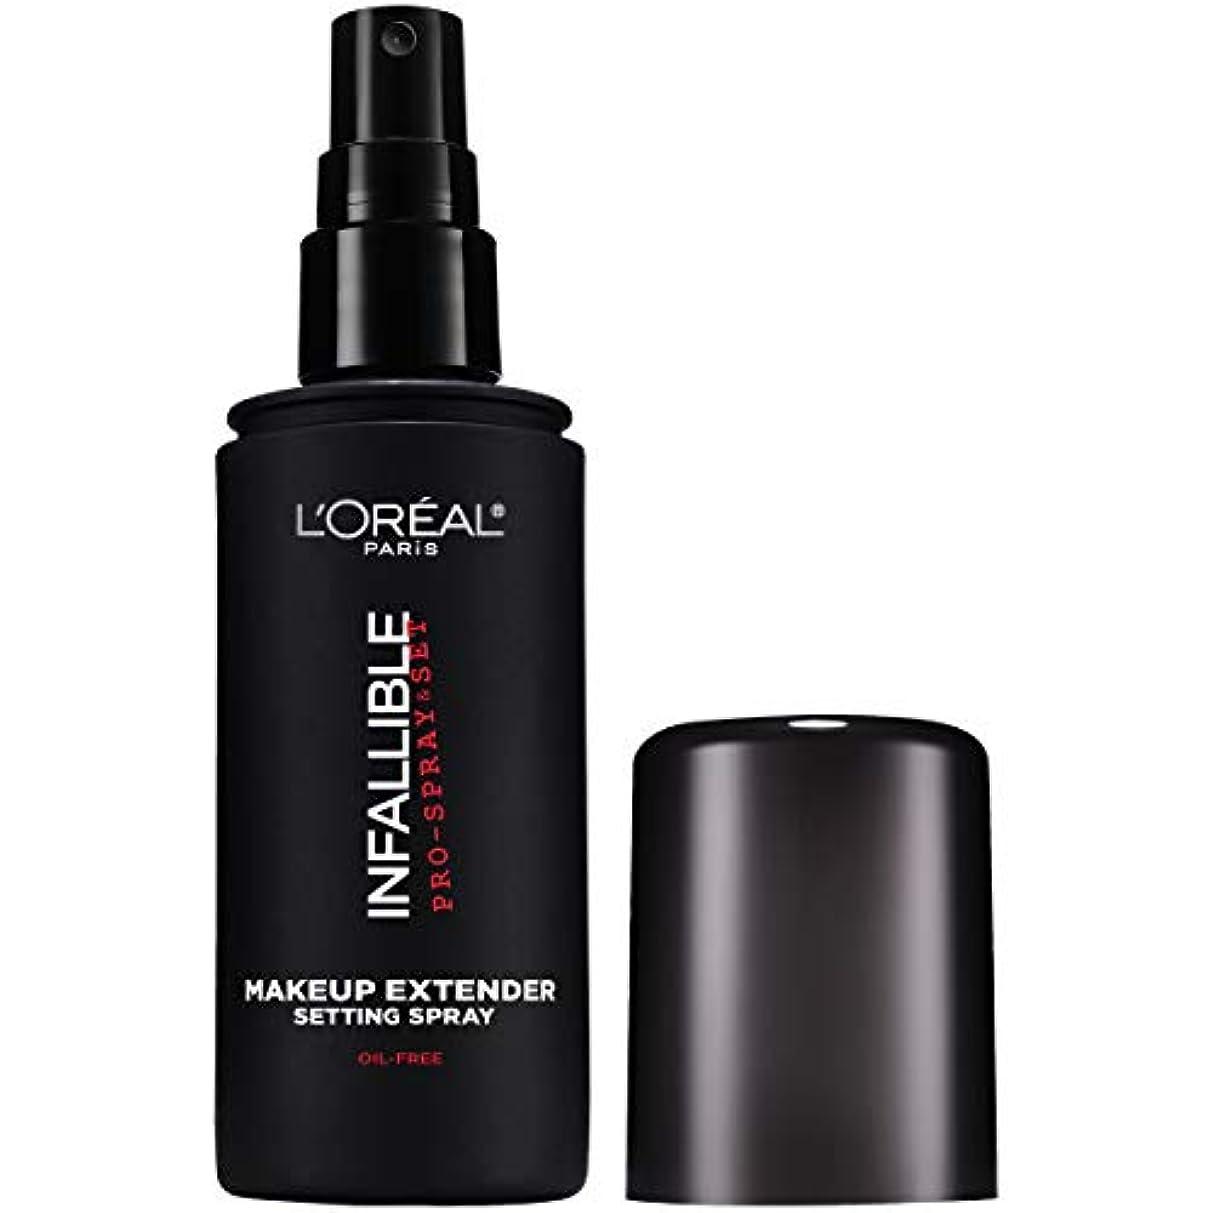 L'OREAL Infallible Pro Spray & Set Makeup Extender Setting Spray (並行輸入品)